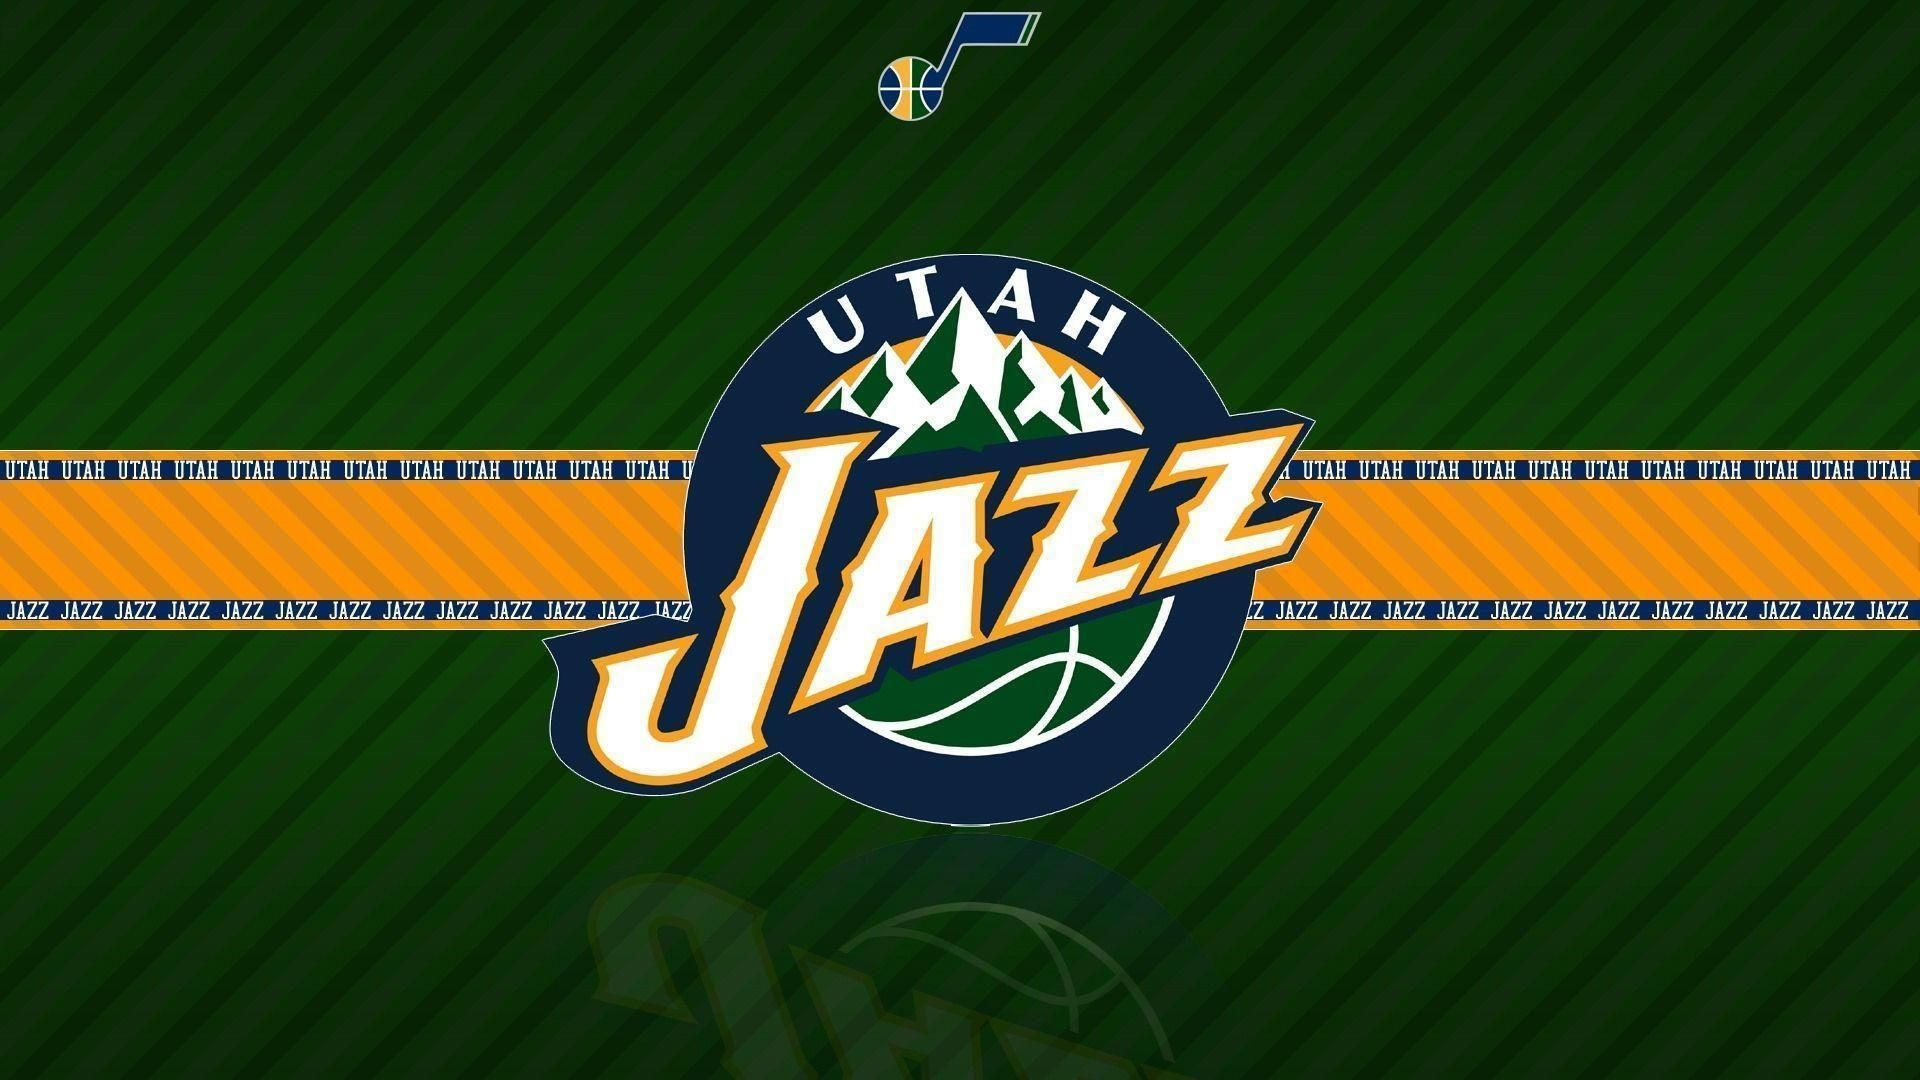 Res: 1920x1080, Utah Jazz Logo Yellow | NBA Team Logos Wallpapers 2016 - Wallpaper Cave